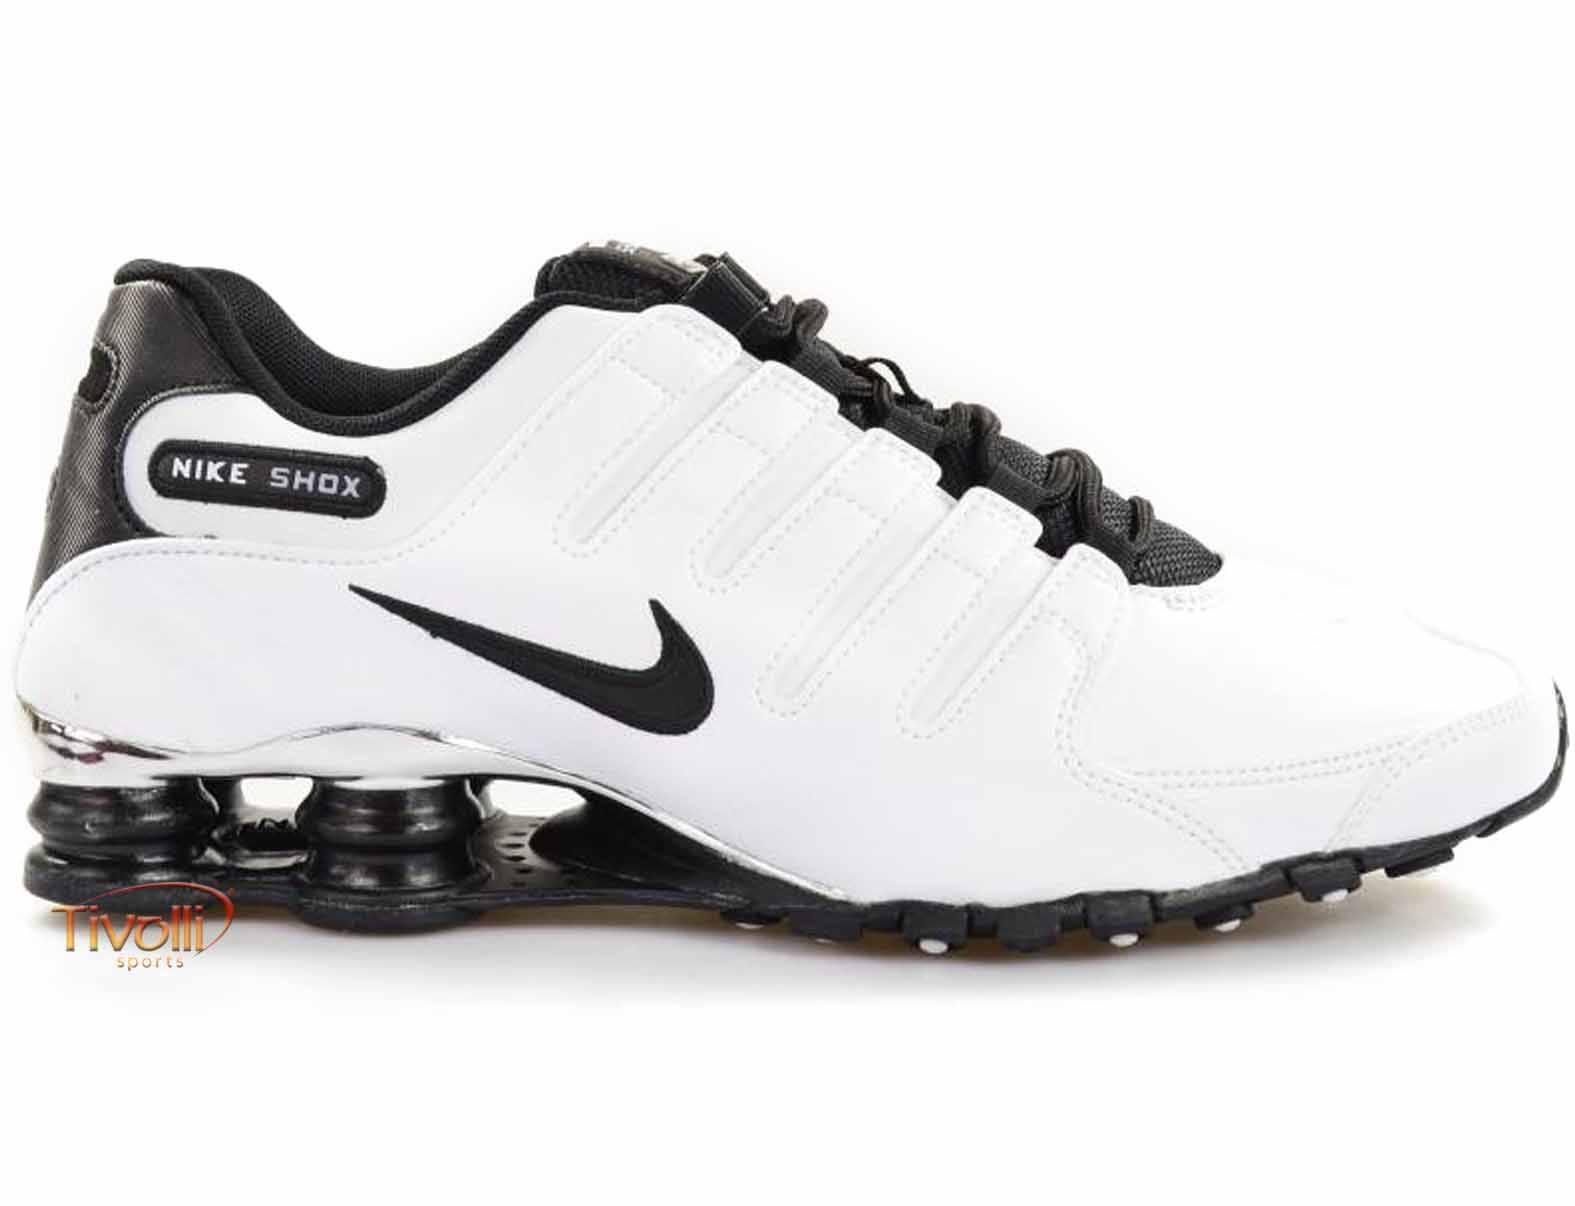 1f5a8778336 Raquete Mania   Tênis Nike Shox NZ Premium   Branco e Preto